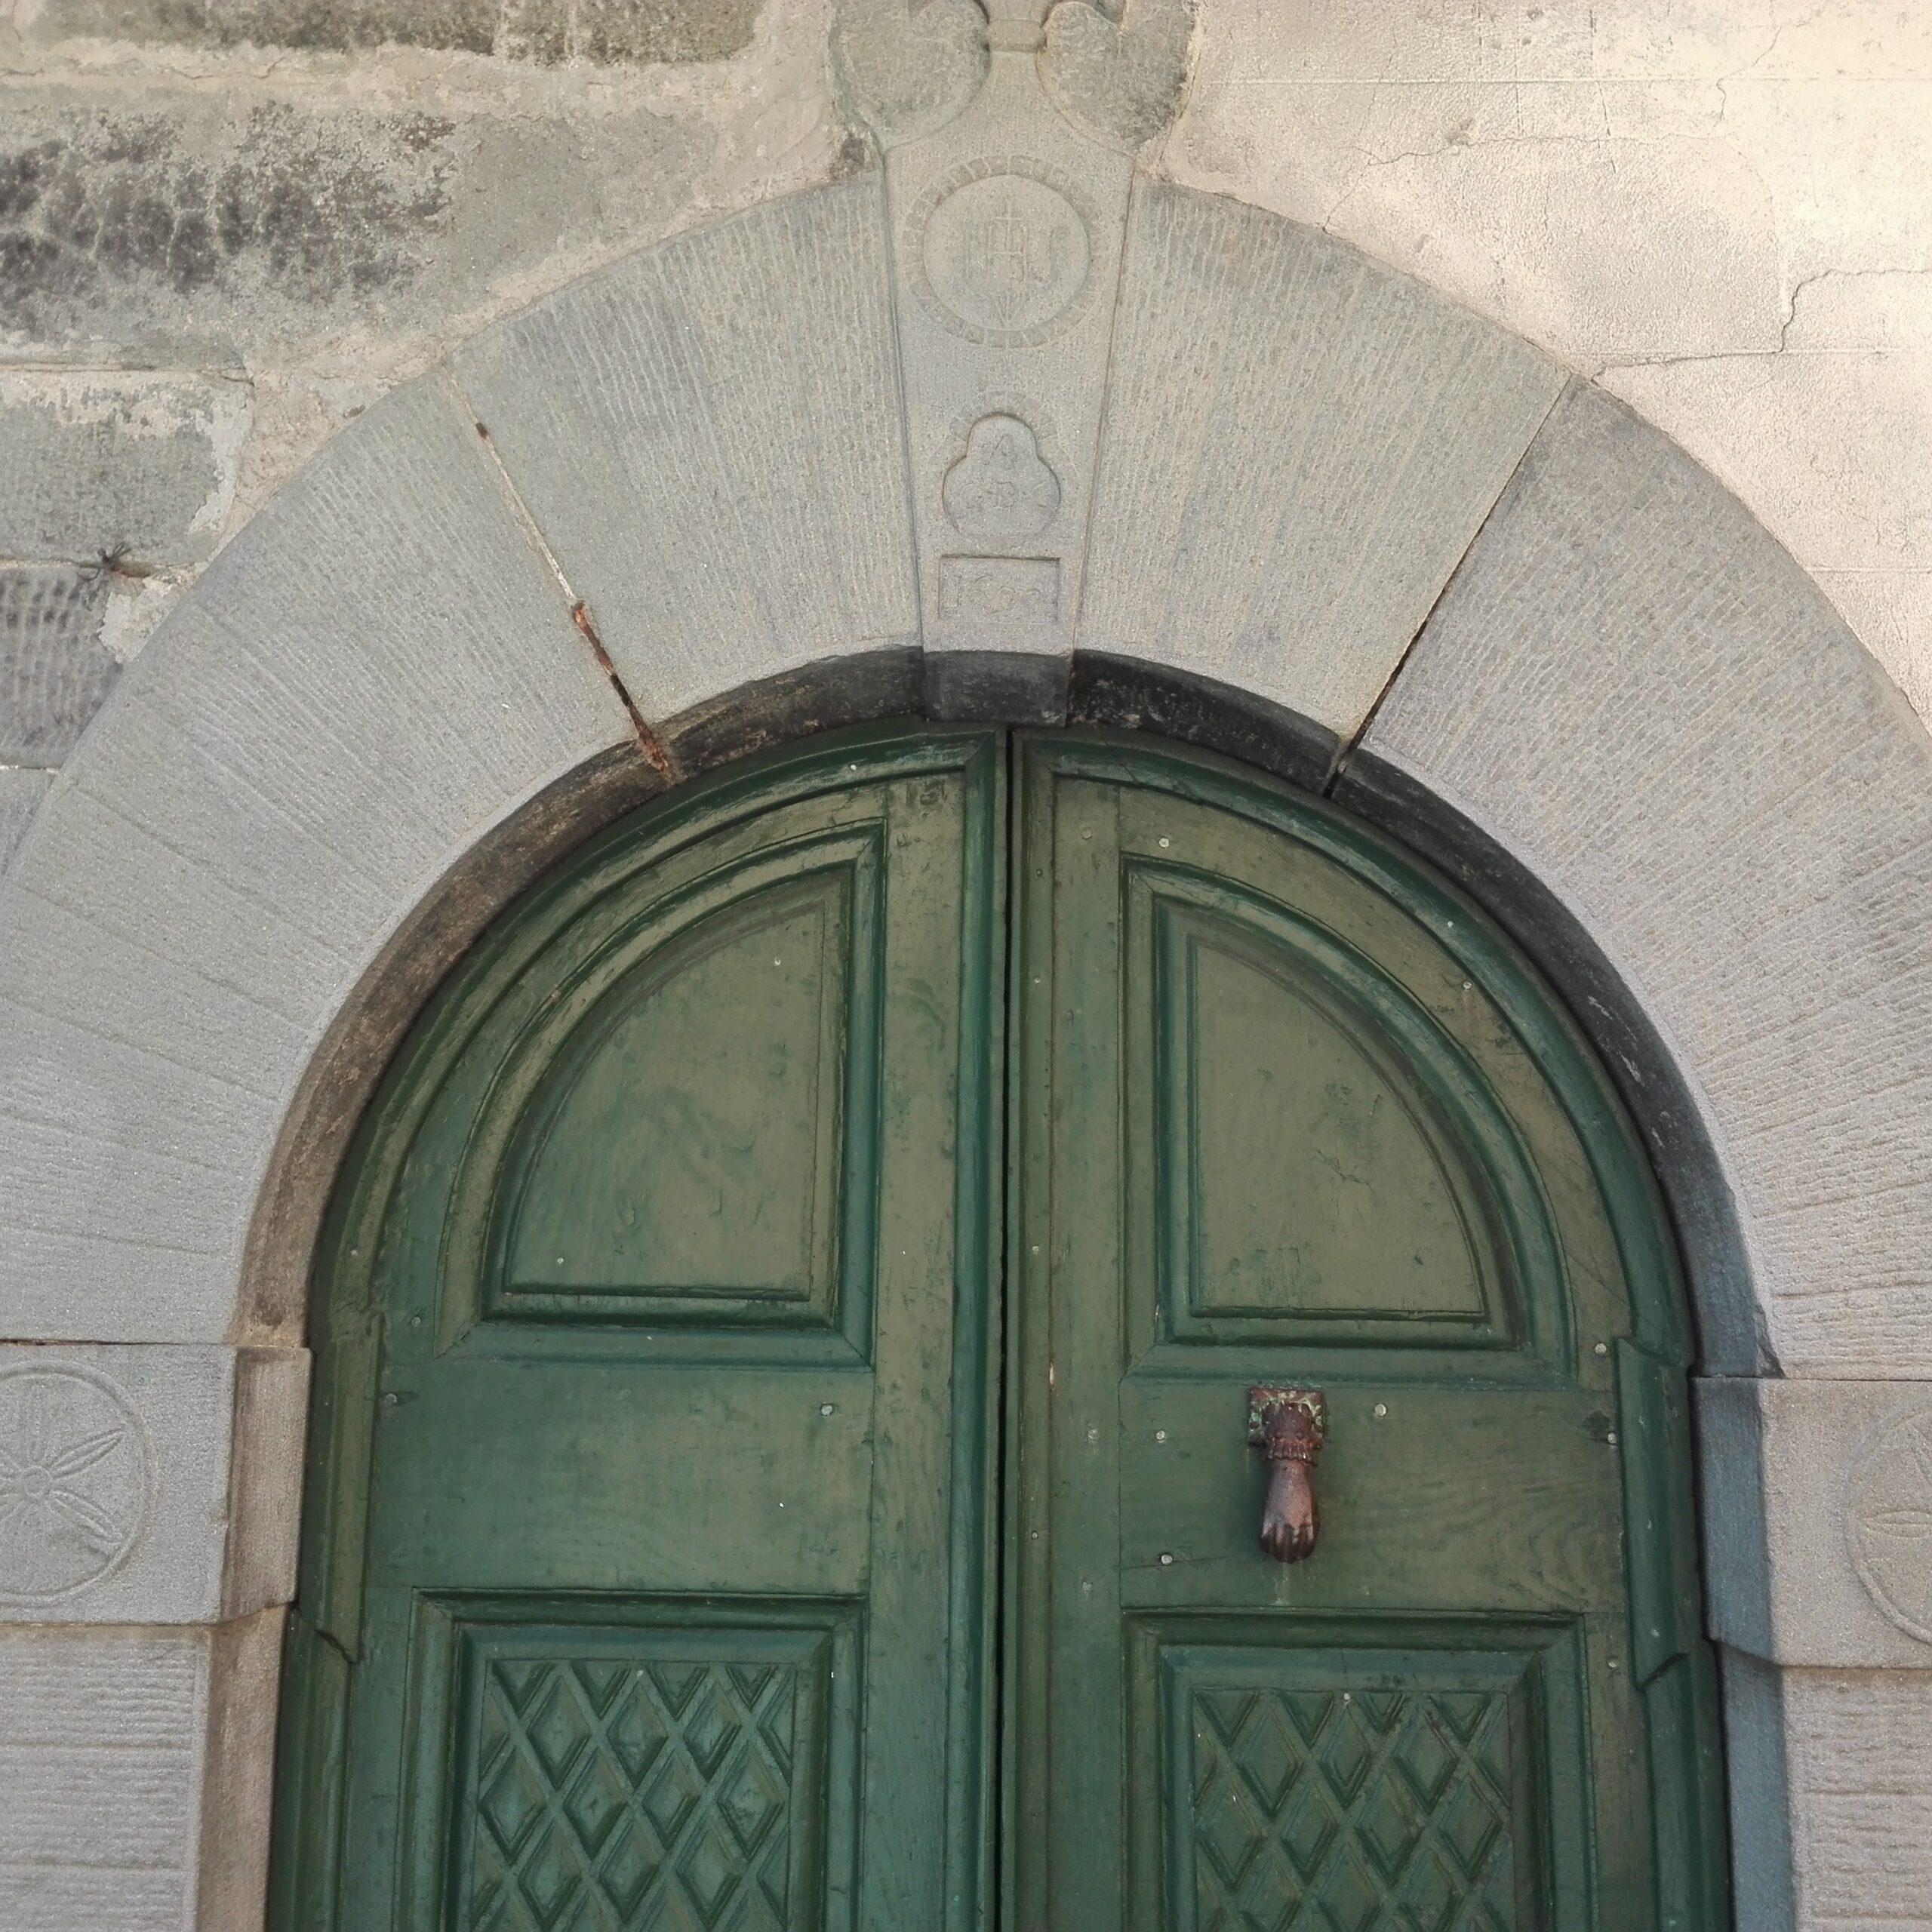 Ancient house with loggia (medieval history). 1143 . Fivizzano Lunigiana